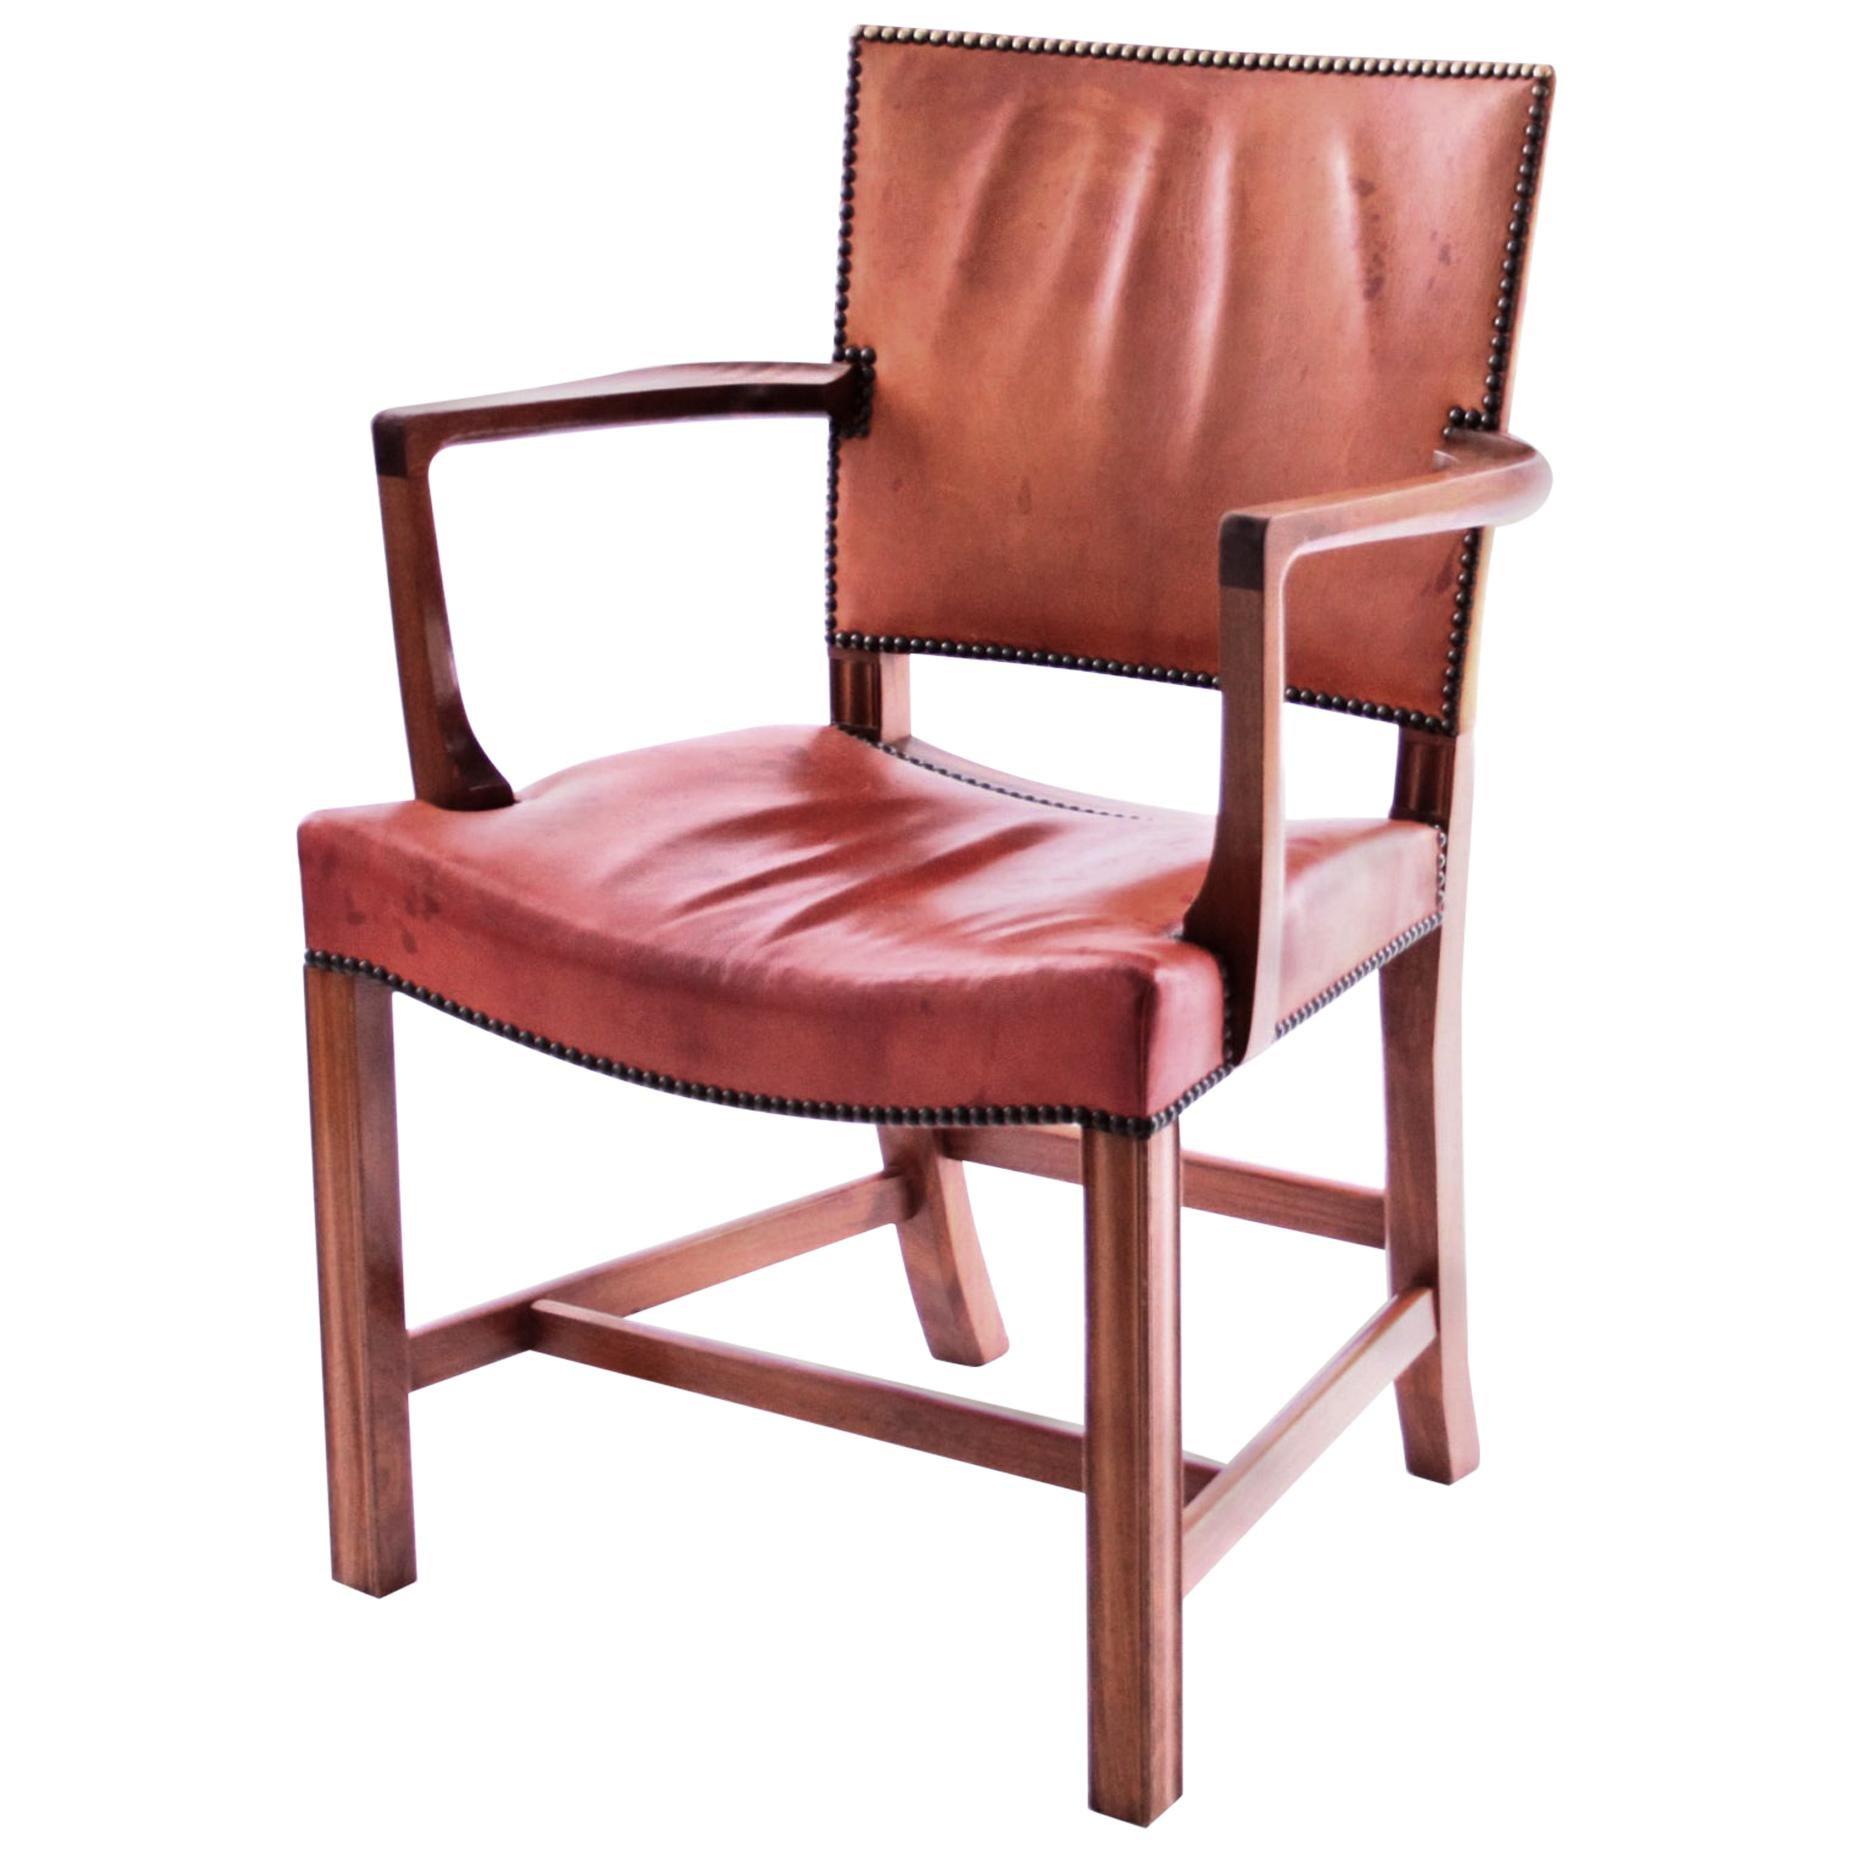 Kaare Klint Red Chair for Rud Rasmussen, Denmark, 1950s